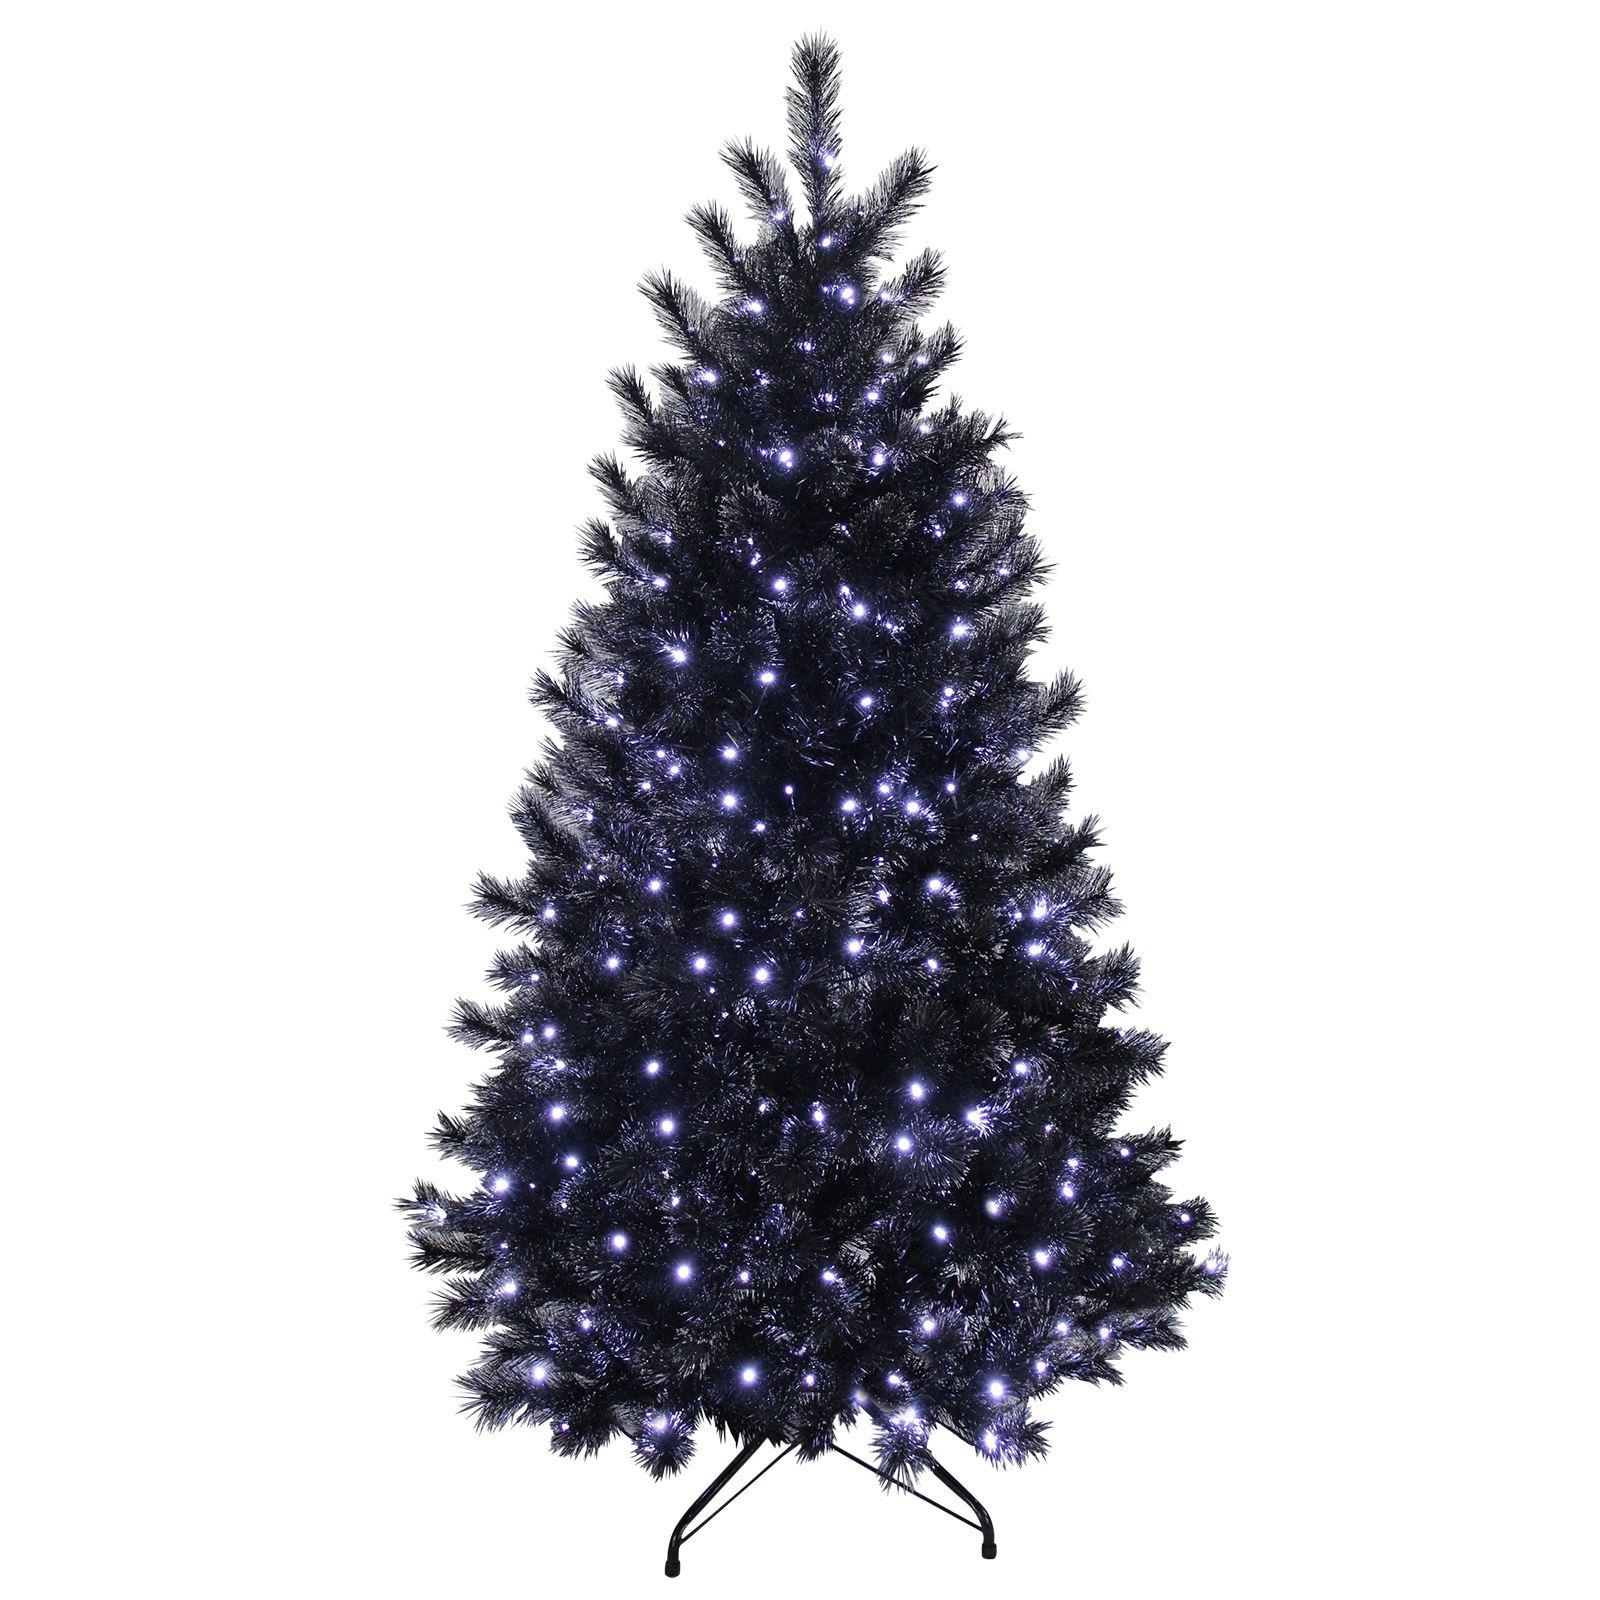 7ft Black Pre Lit Christmas Tree: 6ft Christmas Tree With Lights • Christmas Lights Ideas